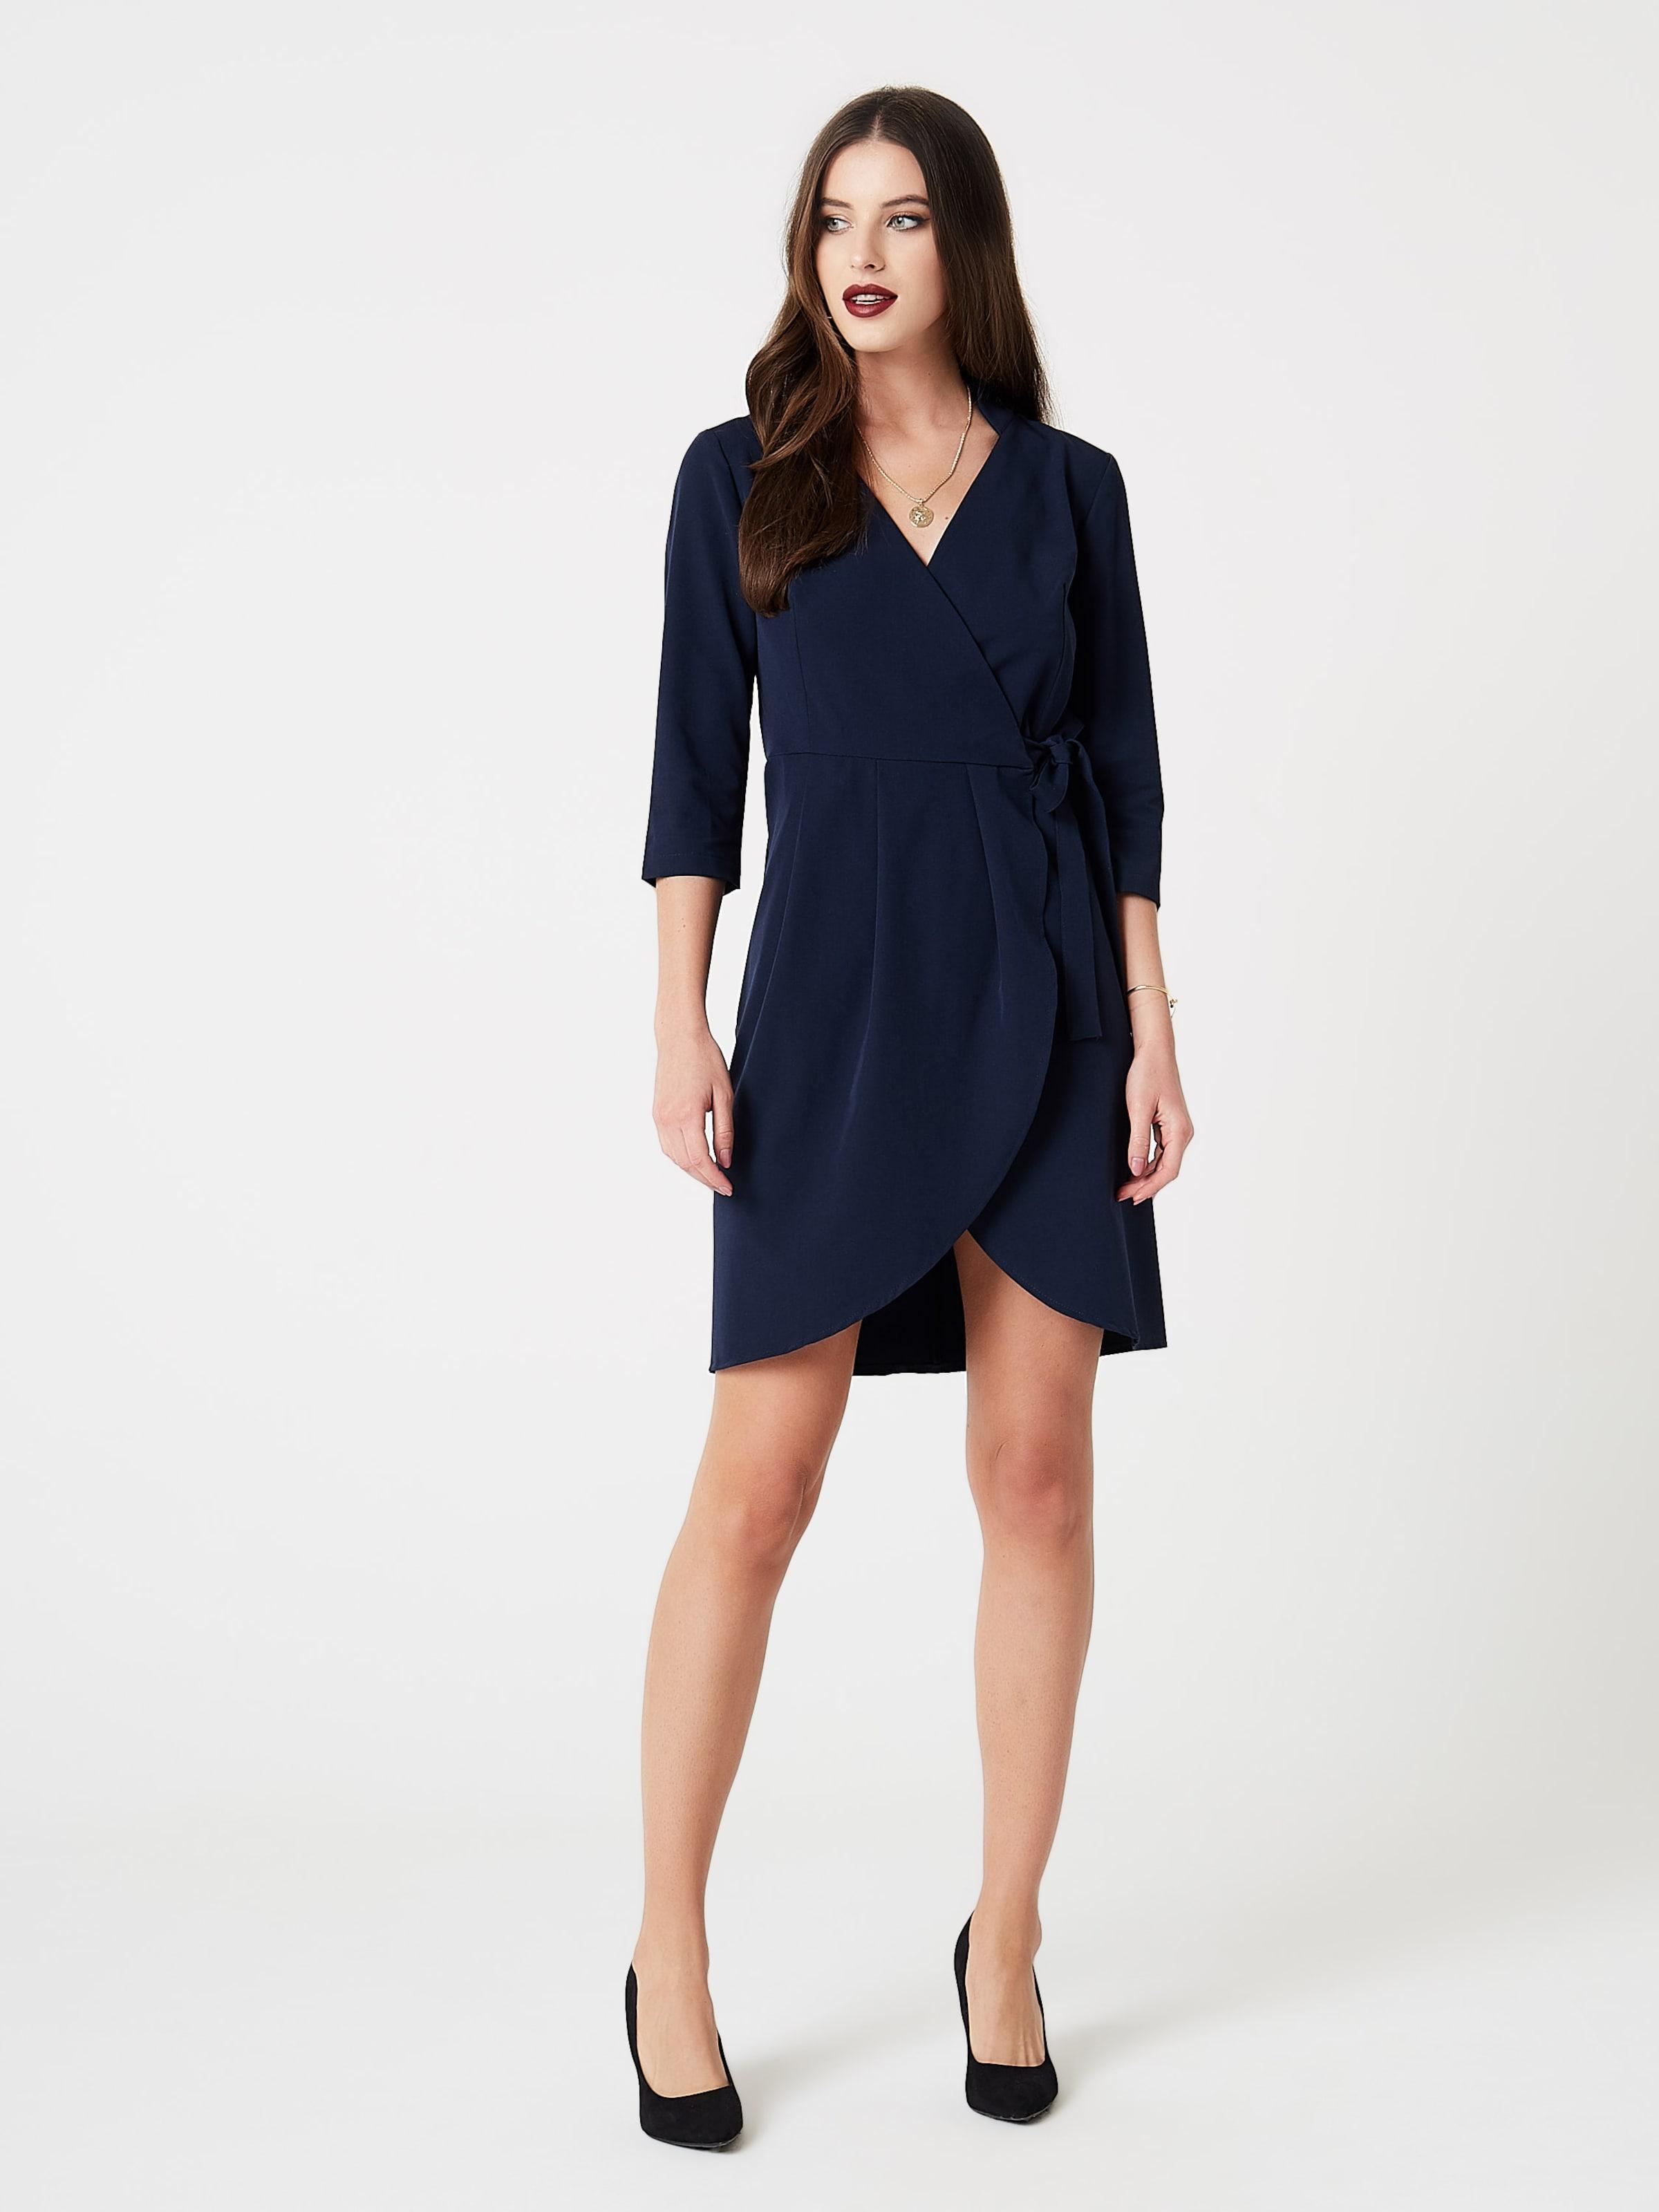 Foncé Robe En Faina Cocktail De Bleu FKl1Jc